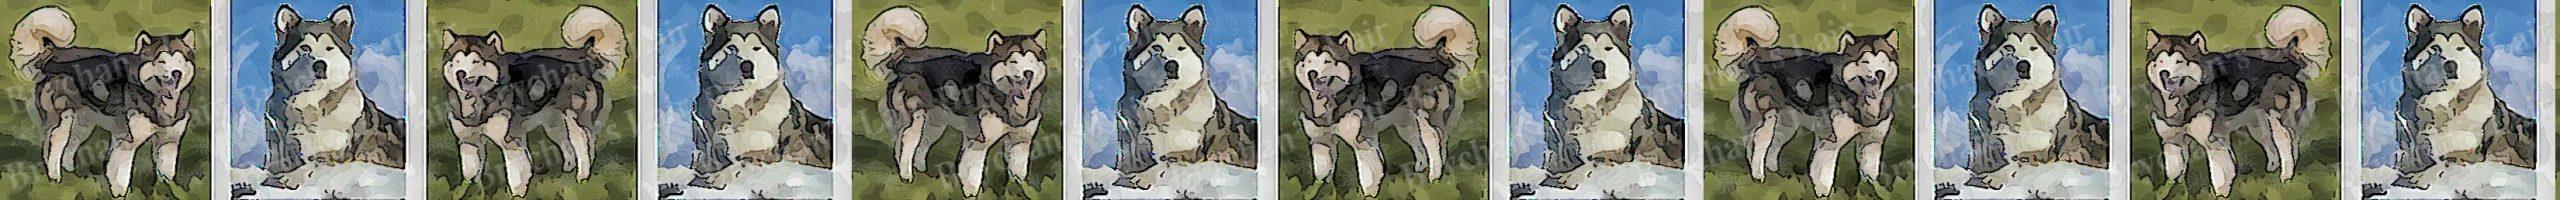 Alaskan Malamute Dog Breed Custom Printed Grosgrain Ribbon